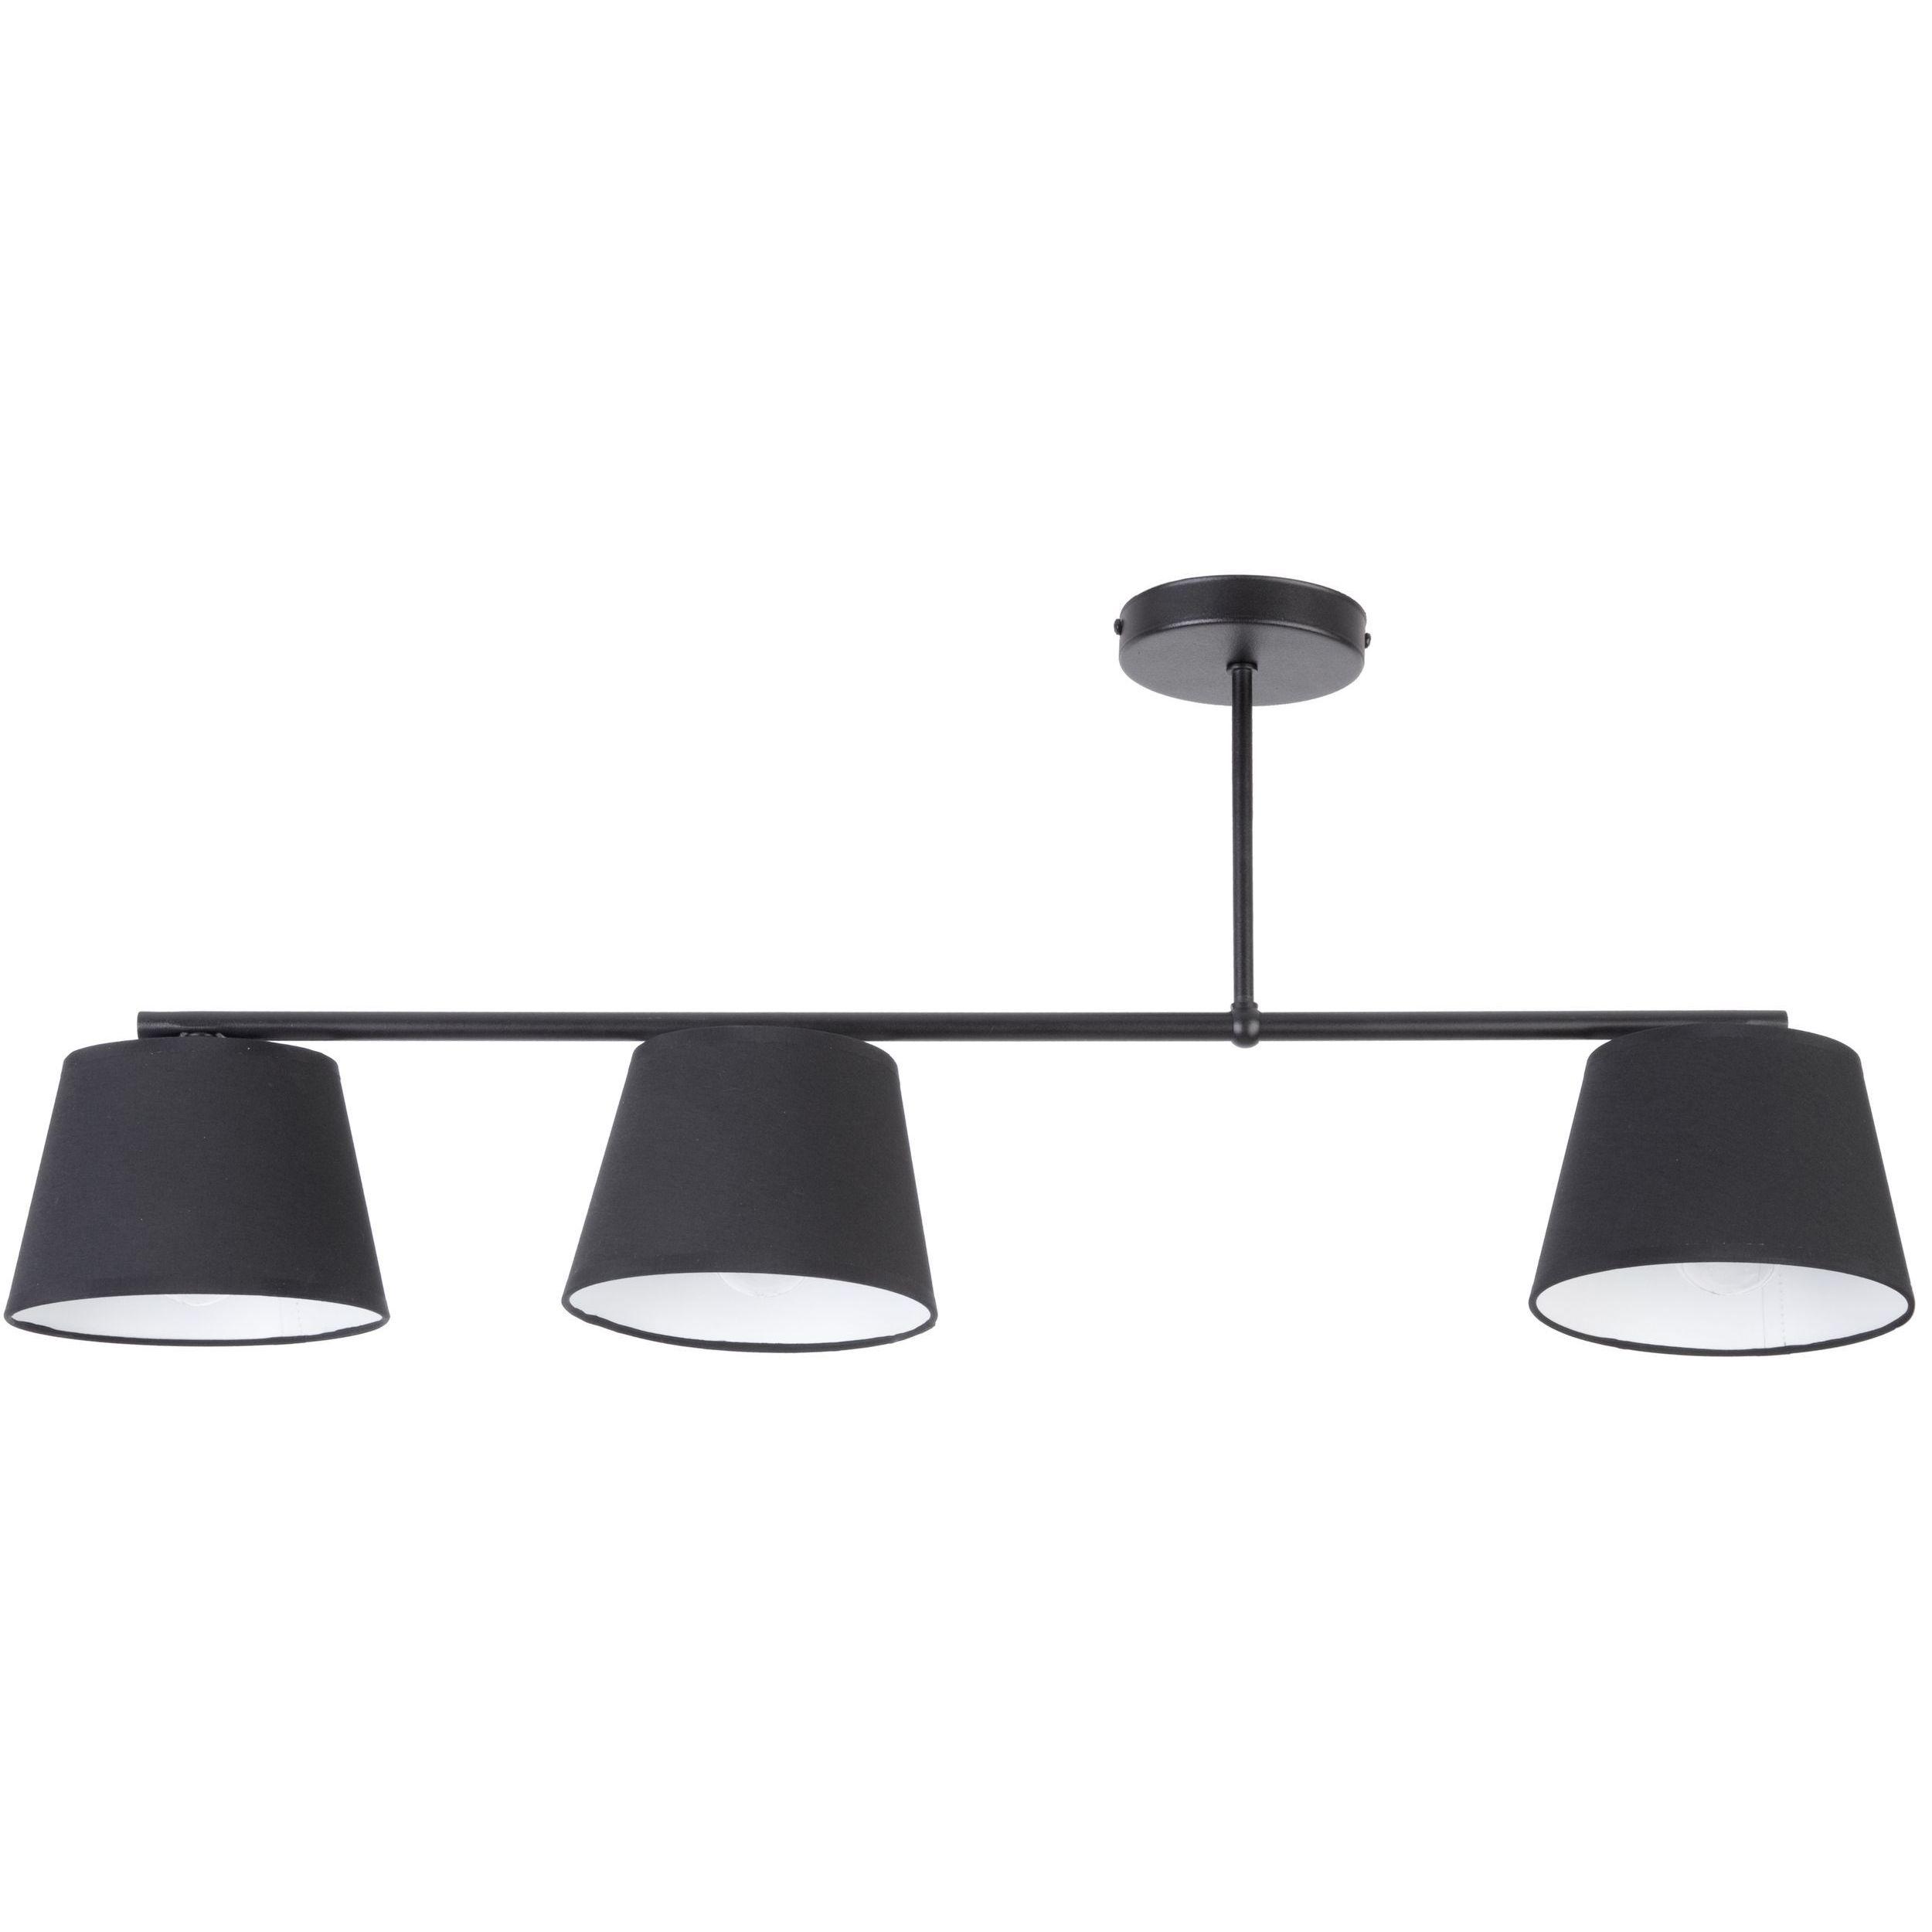 Lampa sufitowa Sigma Febe x3 Czarny